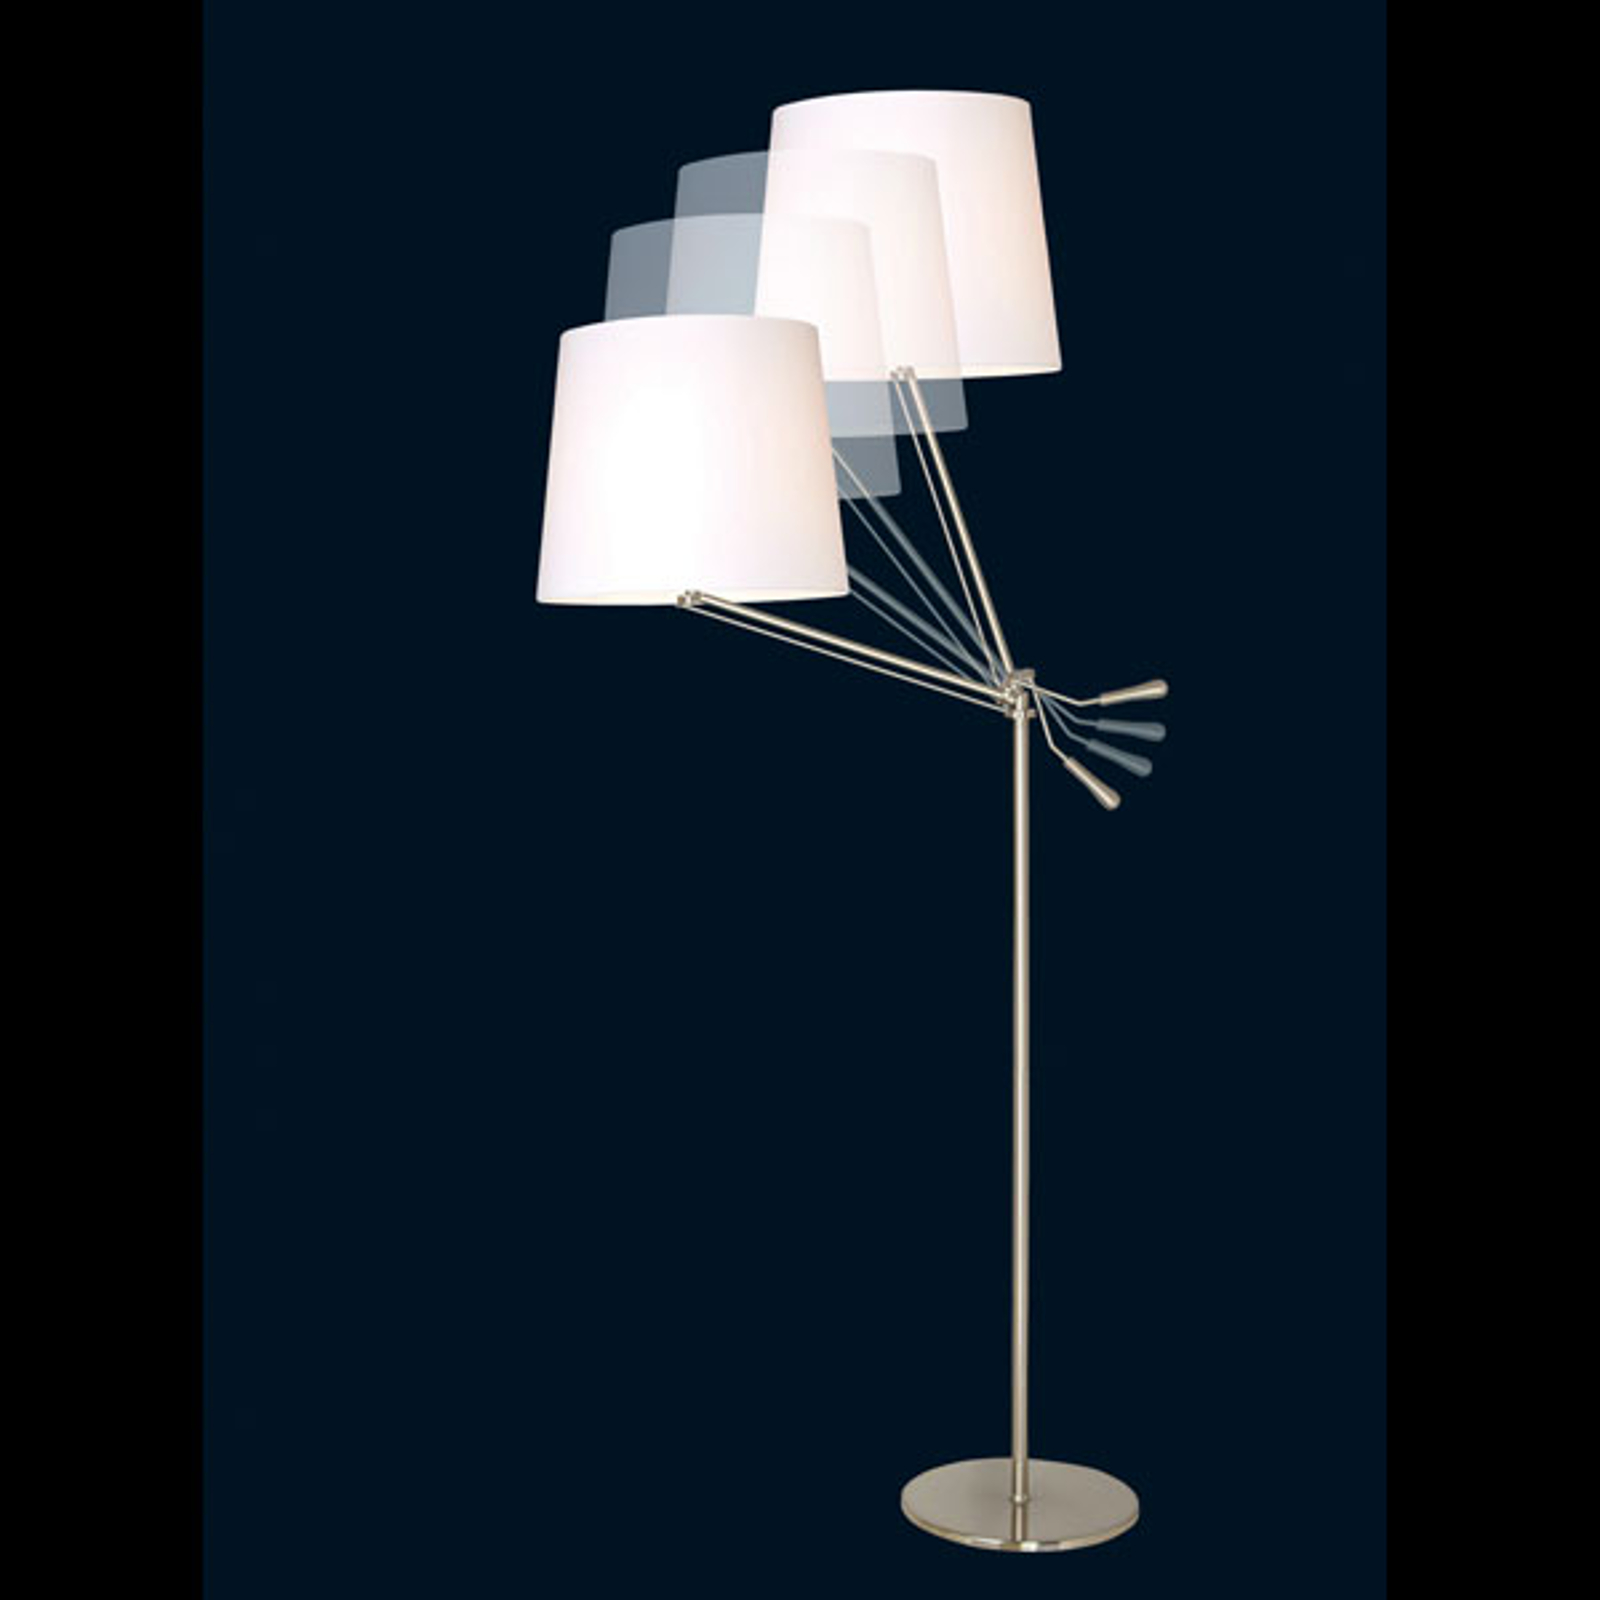 Lampa stojąca Knick